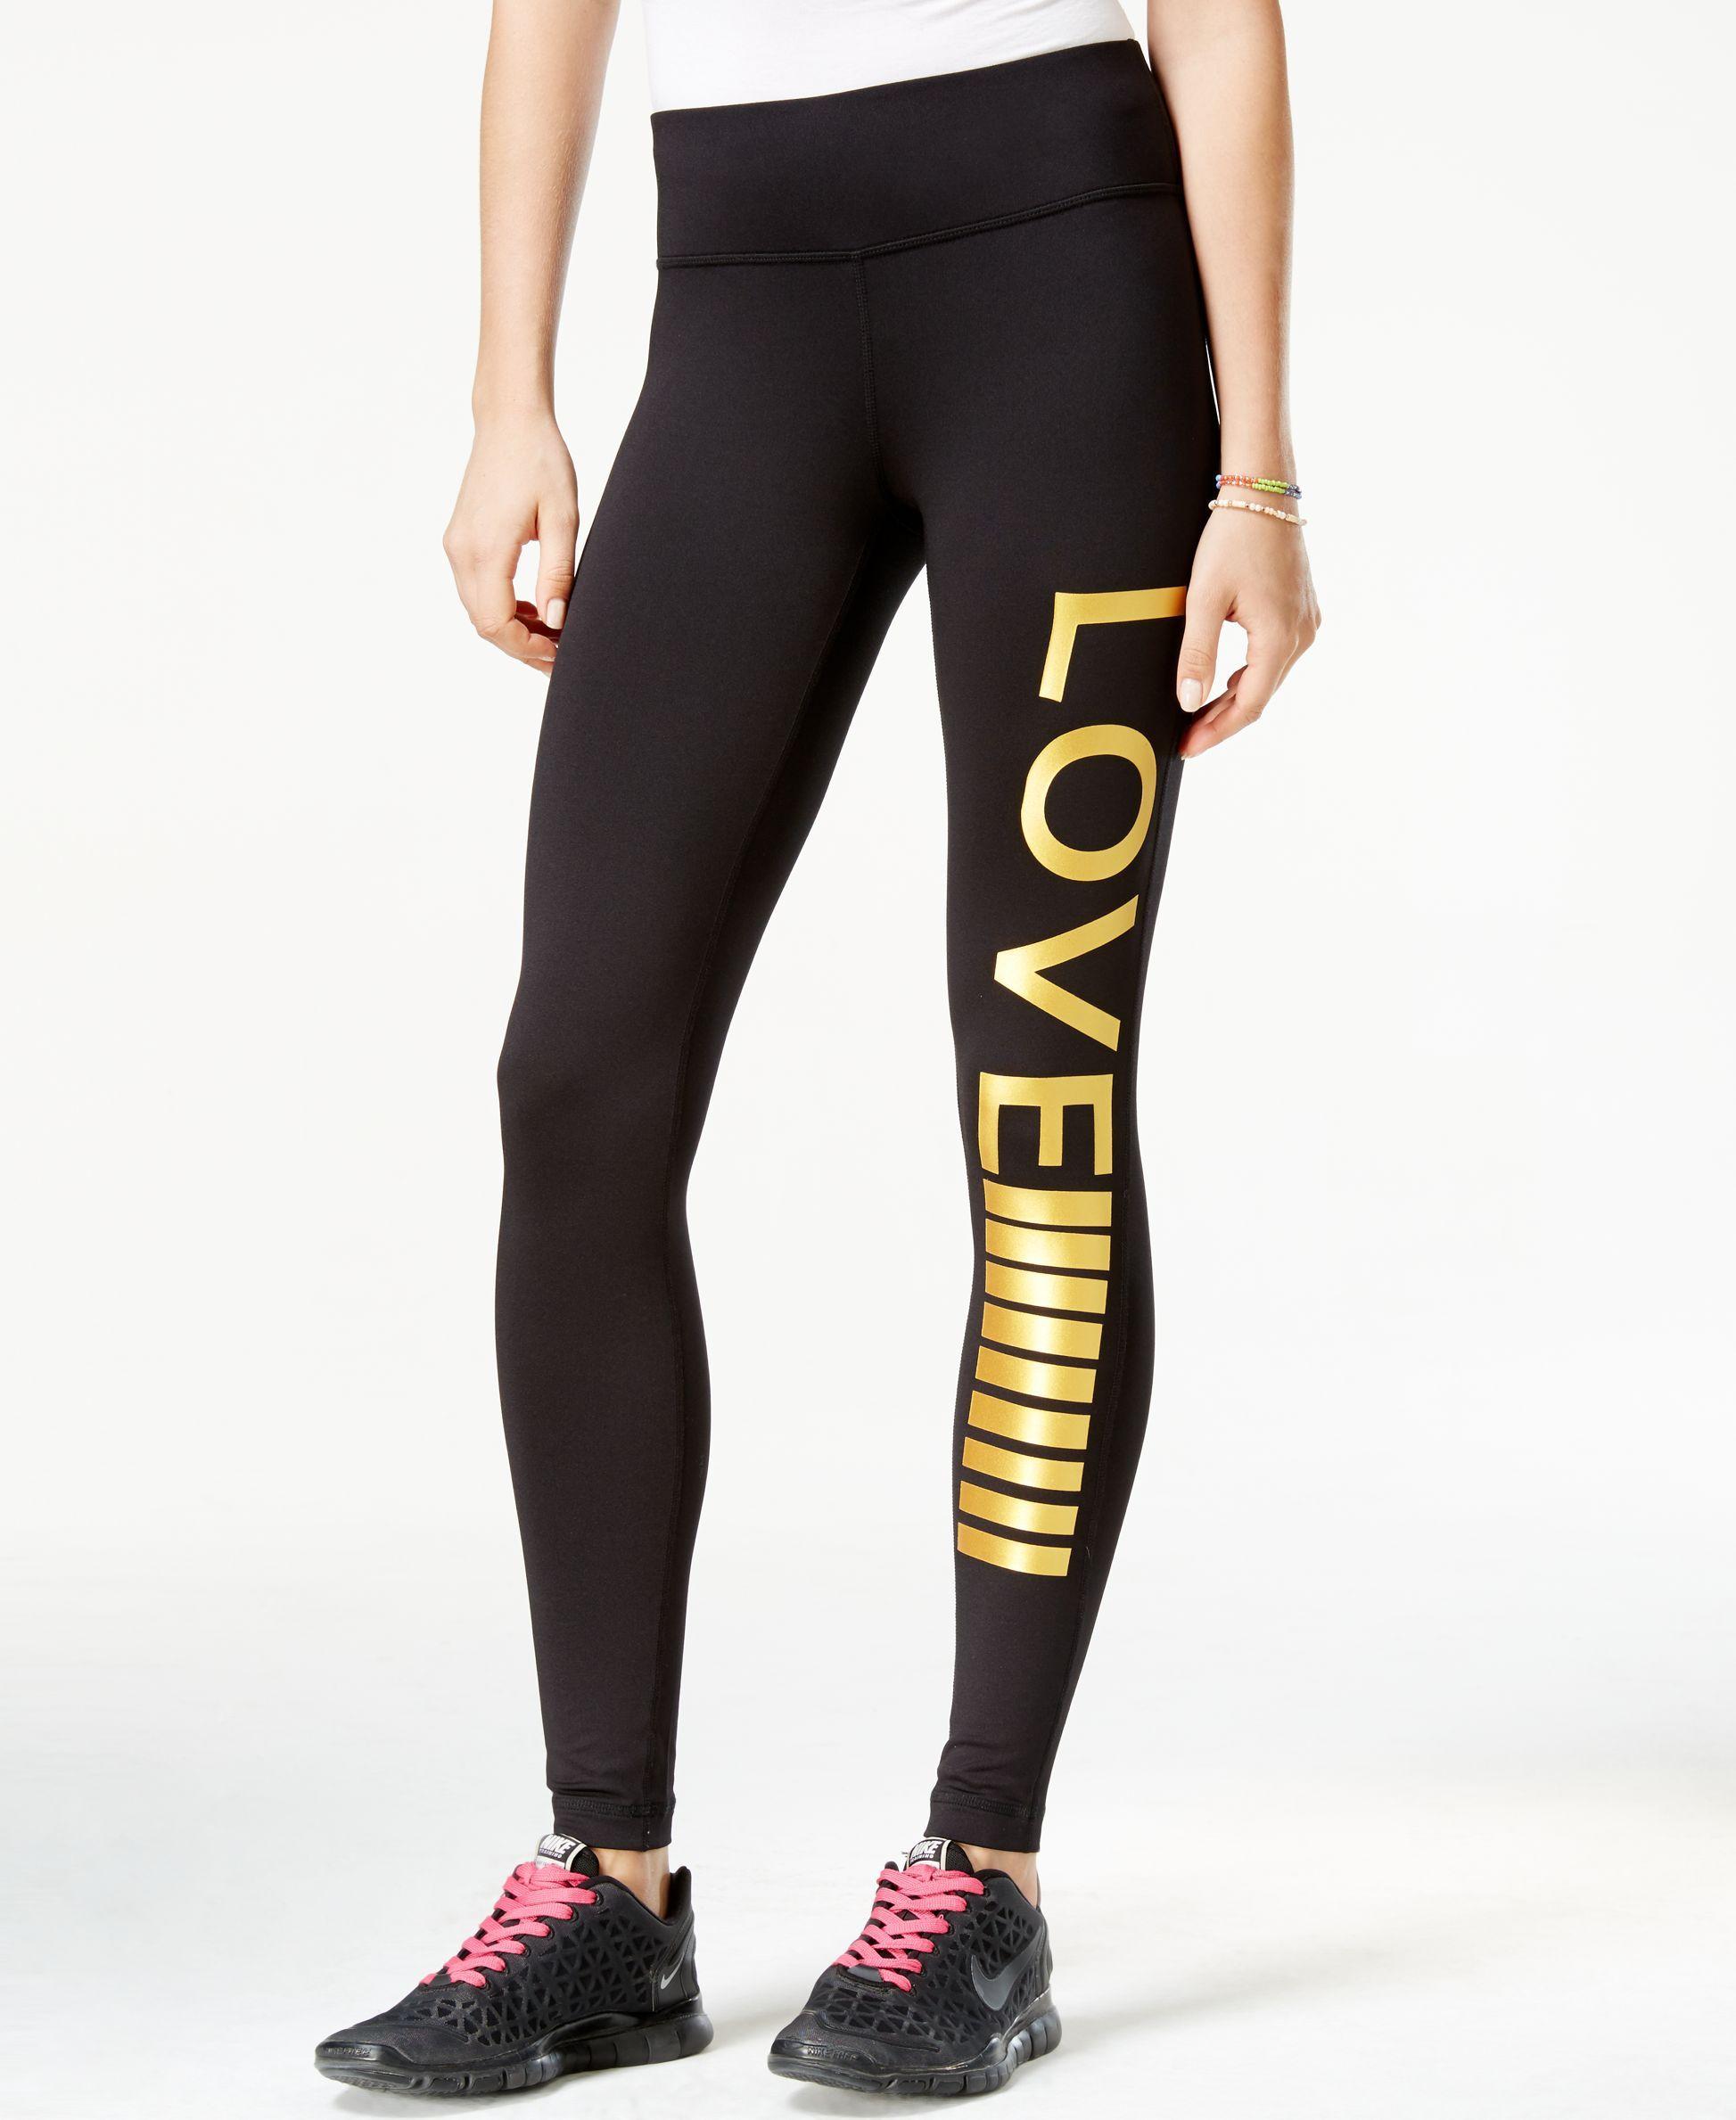 6126771104717 Material Girl Juniors' Love Graphic Leggings, Only at Macy's ...